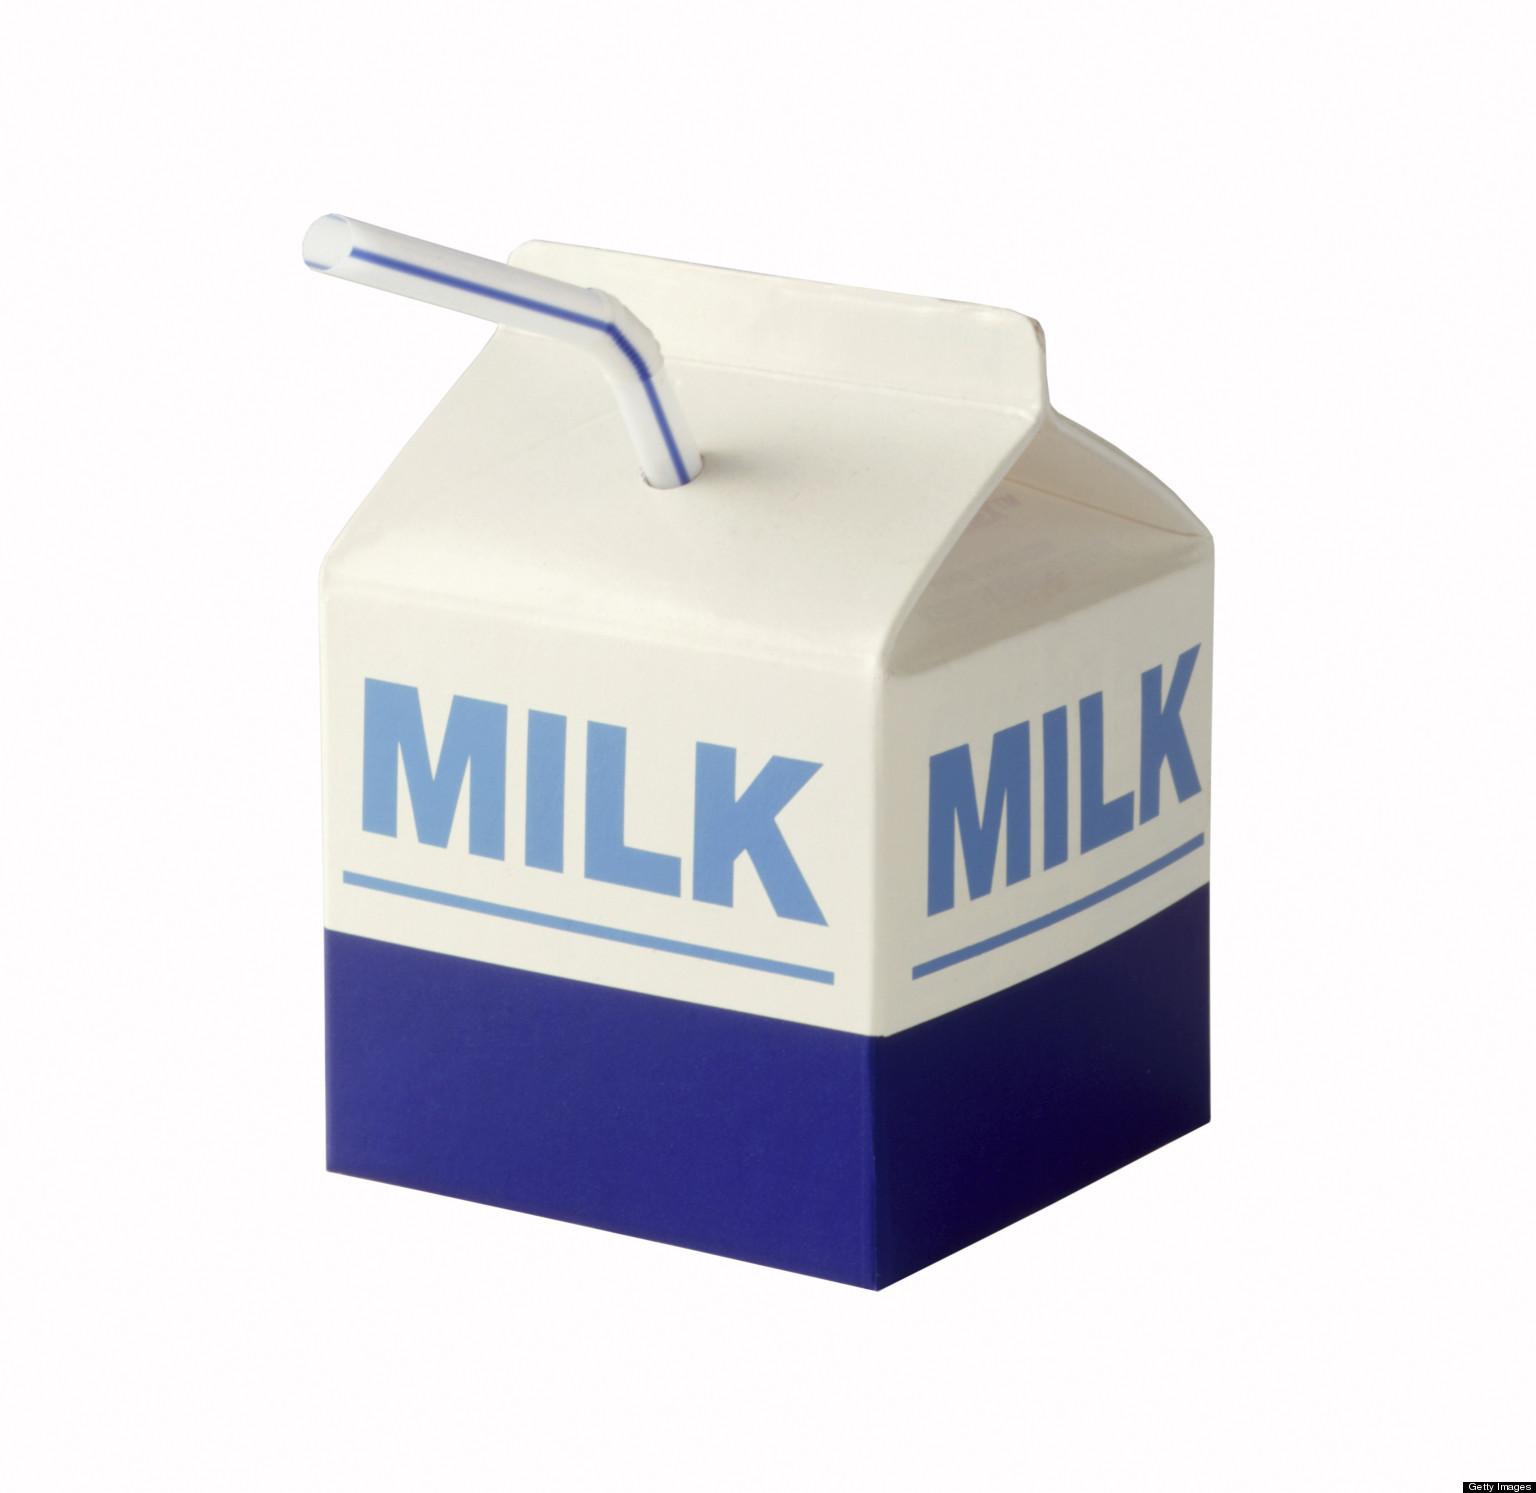 Milk container. (FIle Photo)